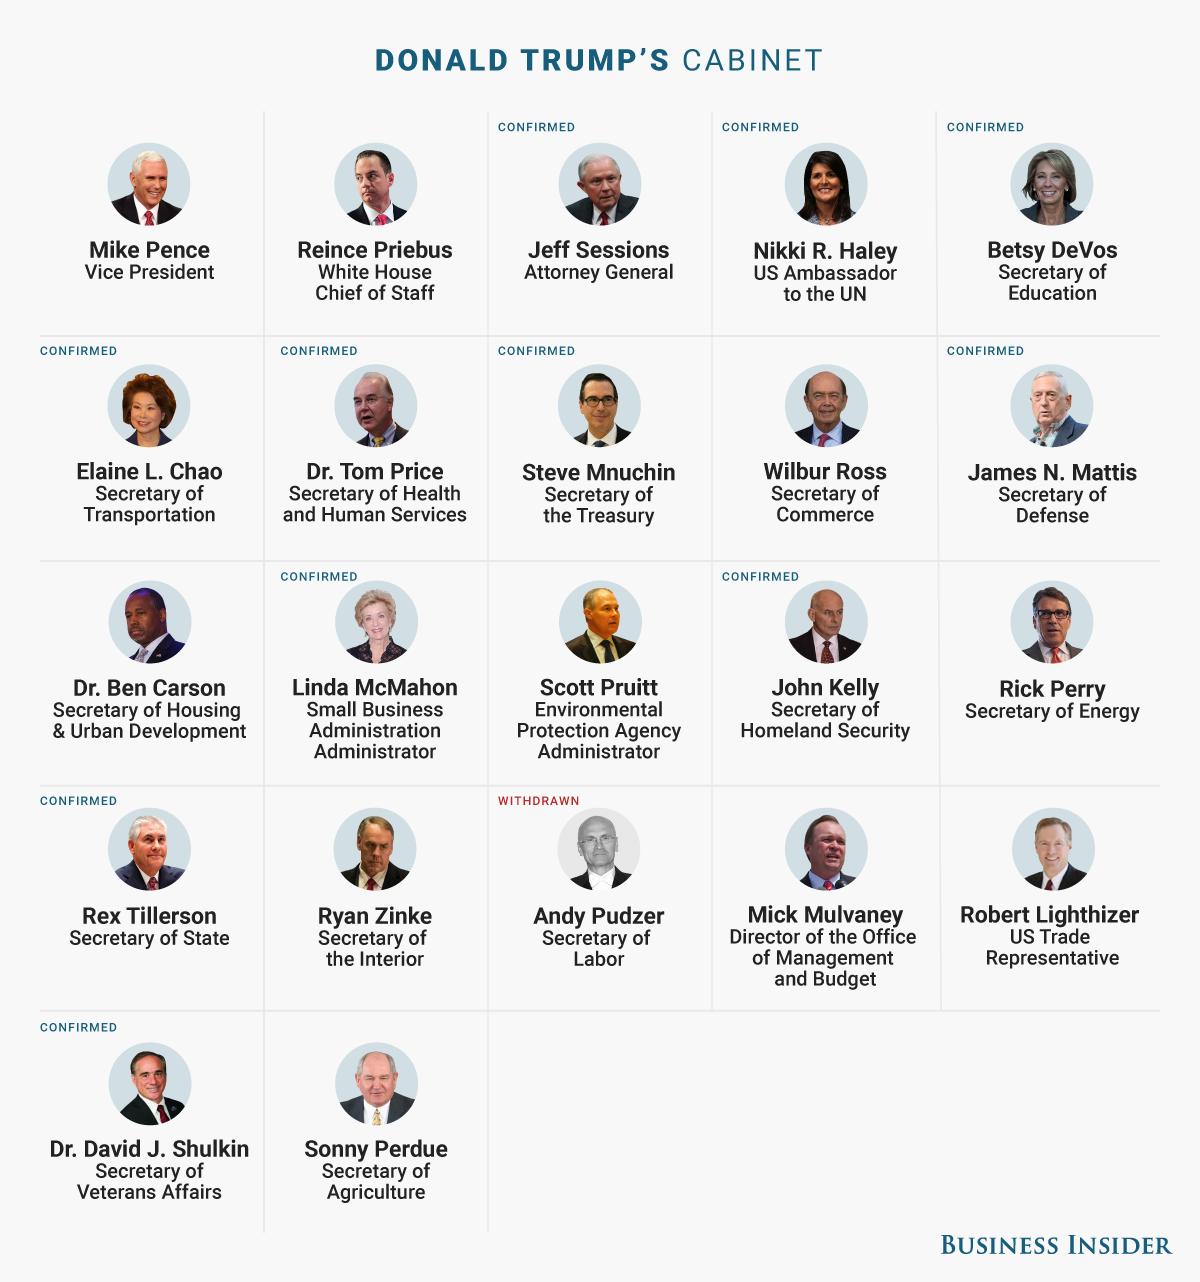 Donald Trumps Cabinet